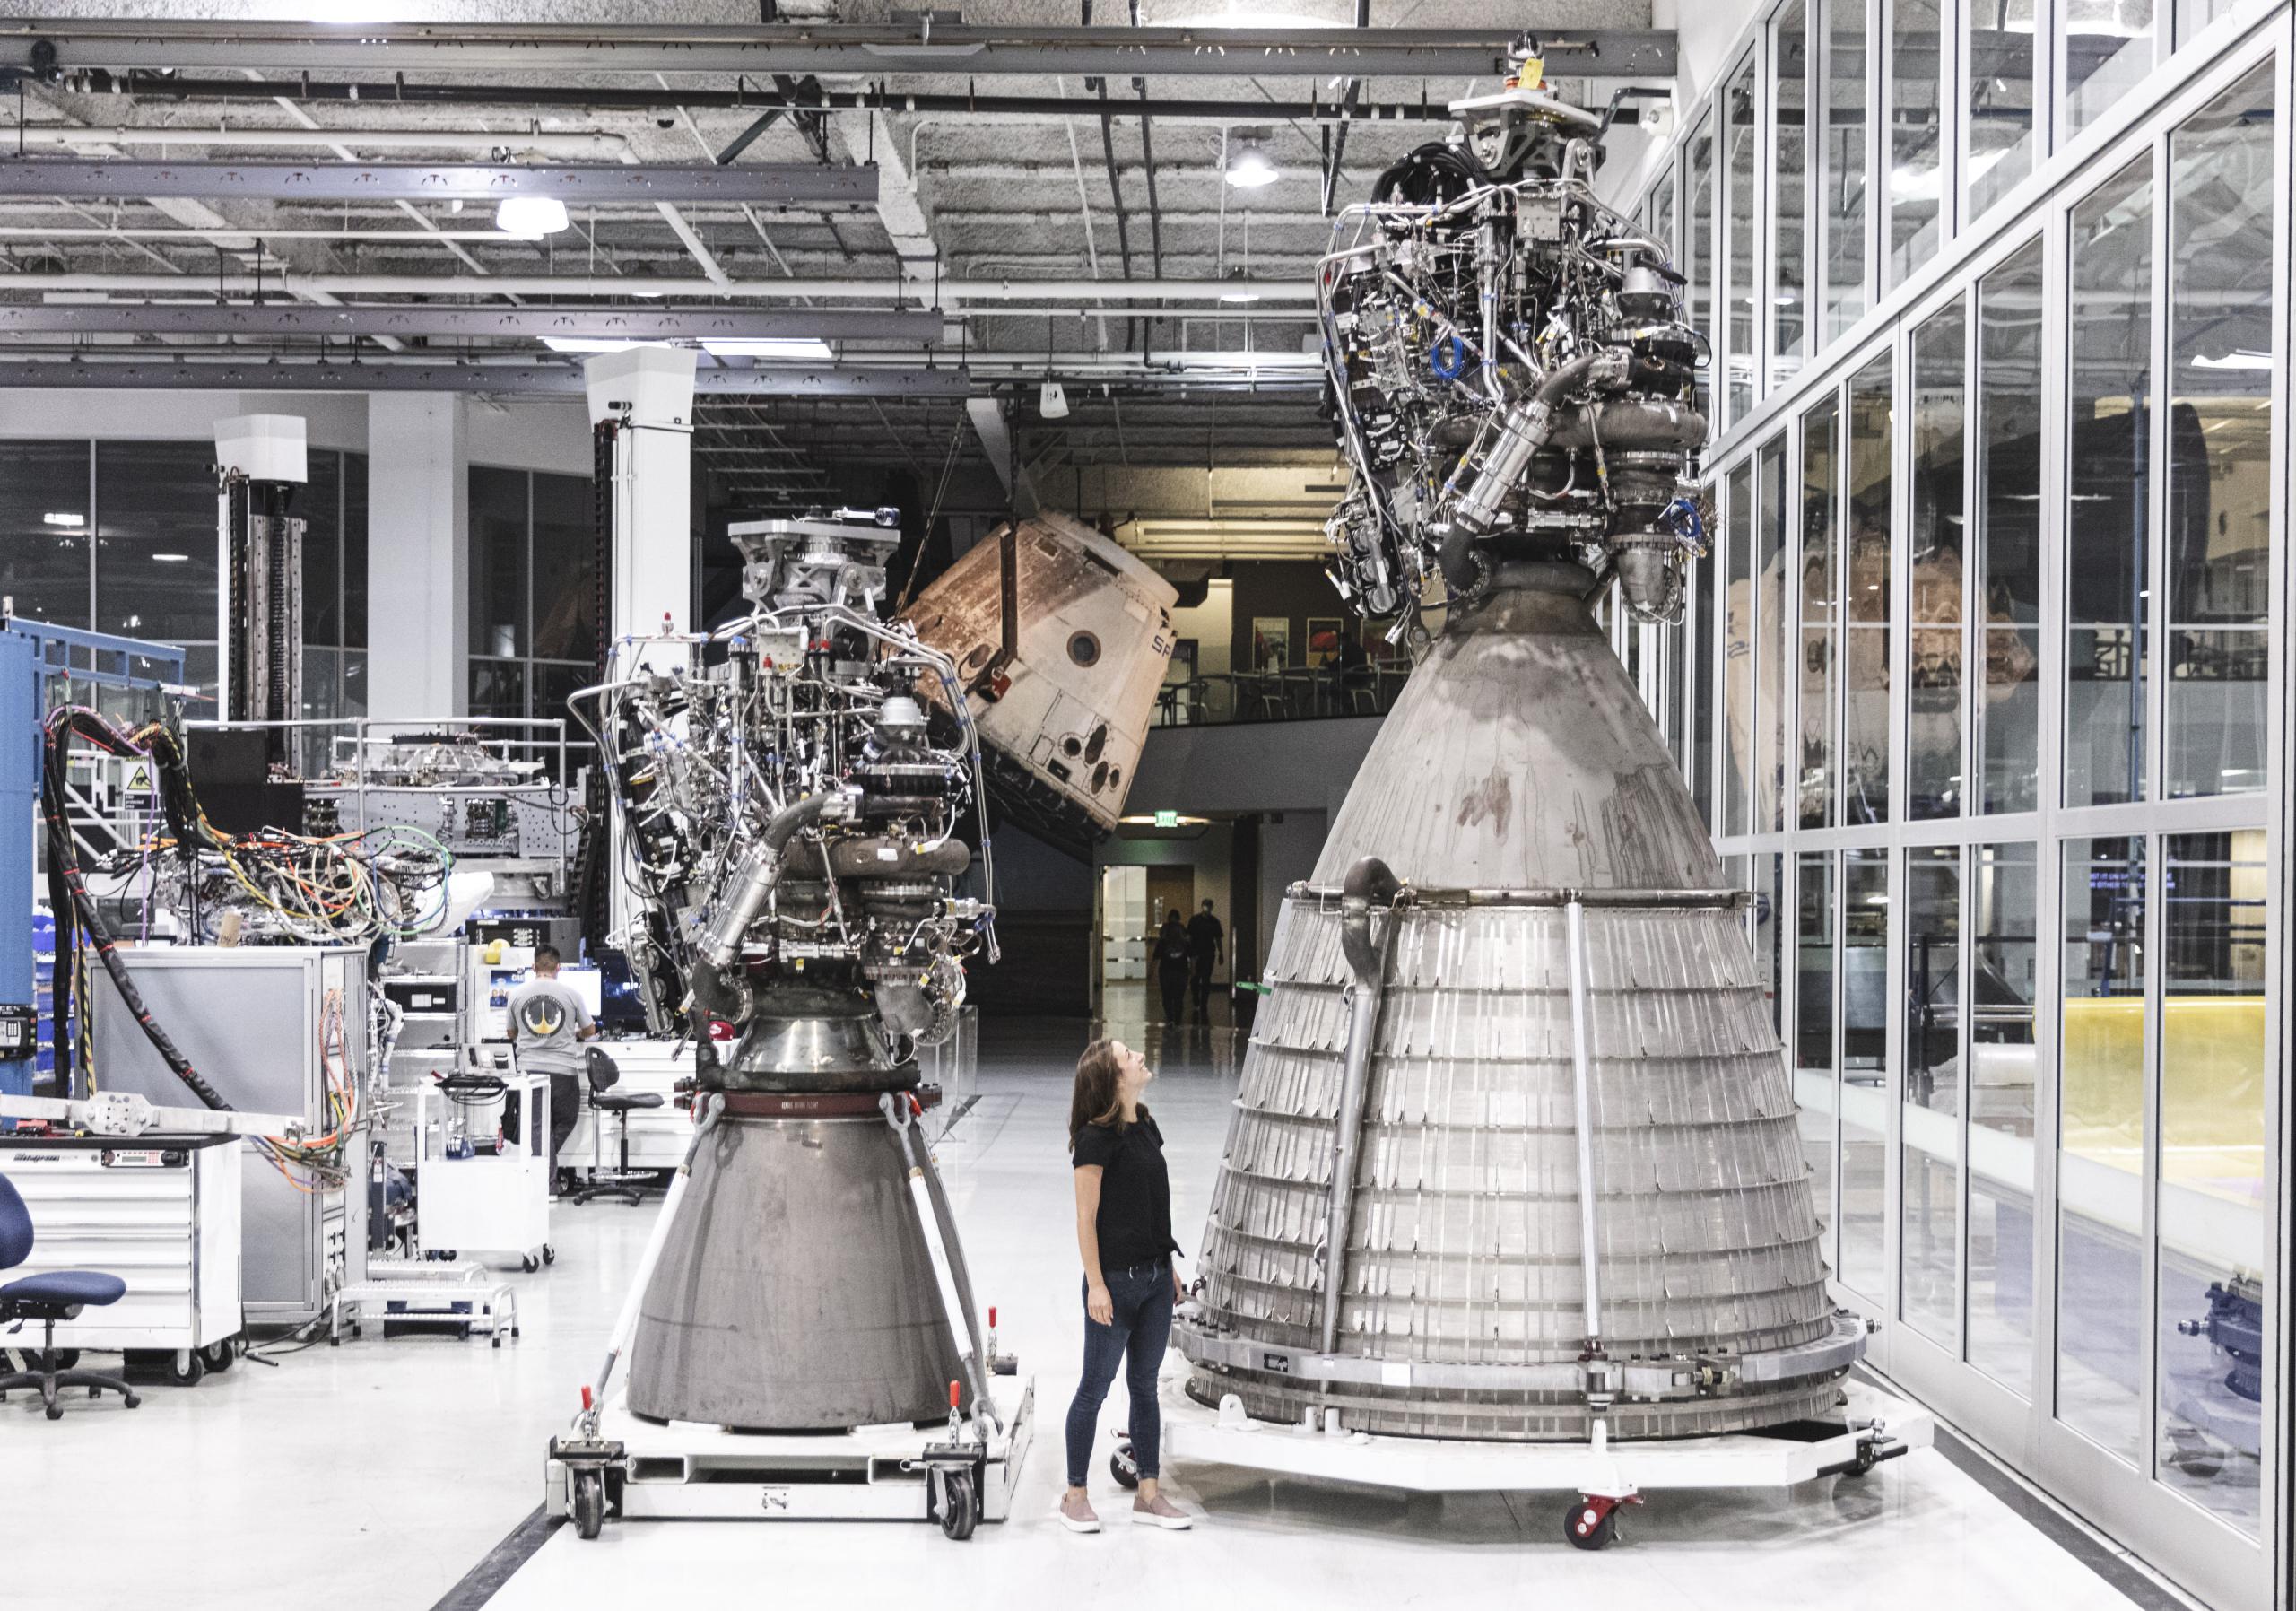 Raptor SN4x Raptor Vacuum SN0x Hawthorne Sept 2020 (SpaceX) 1 (c)